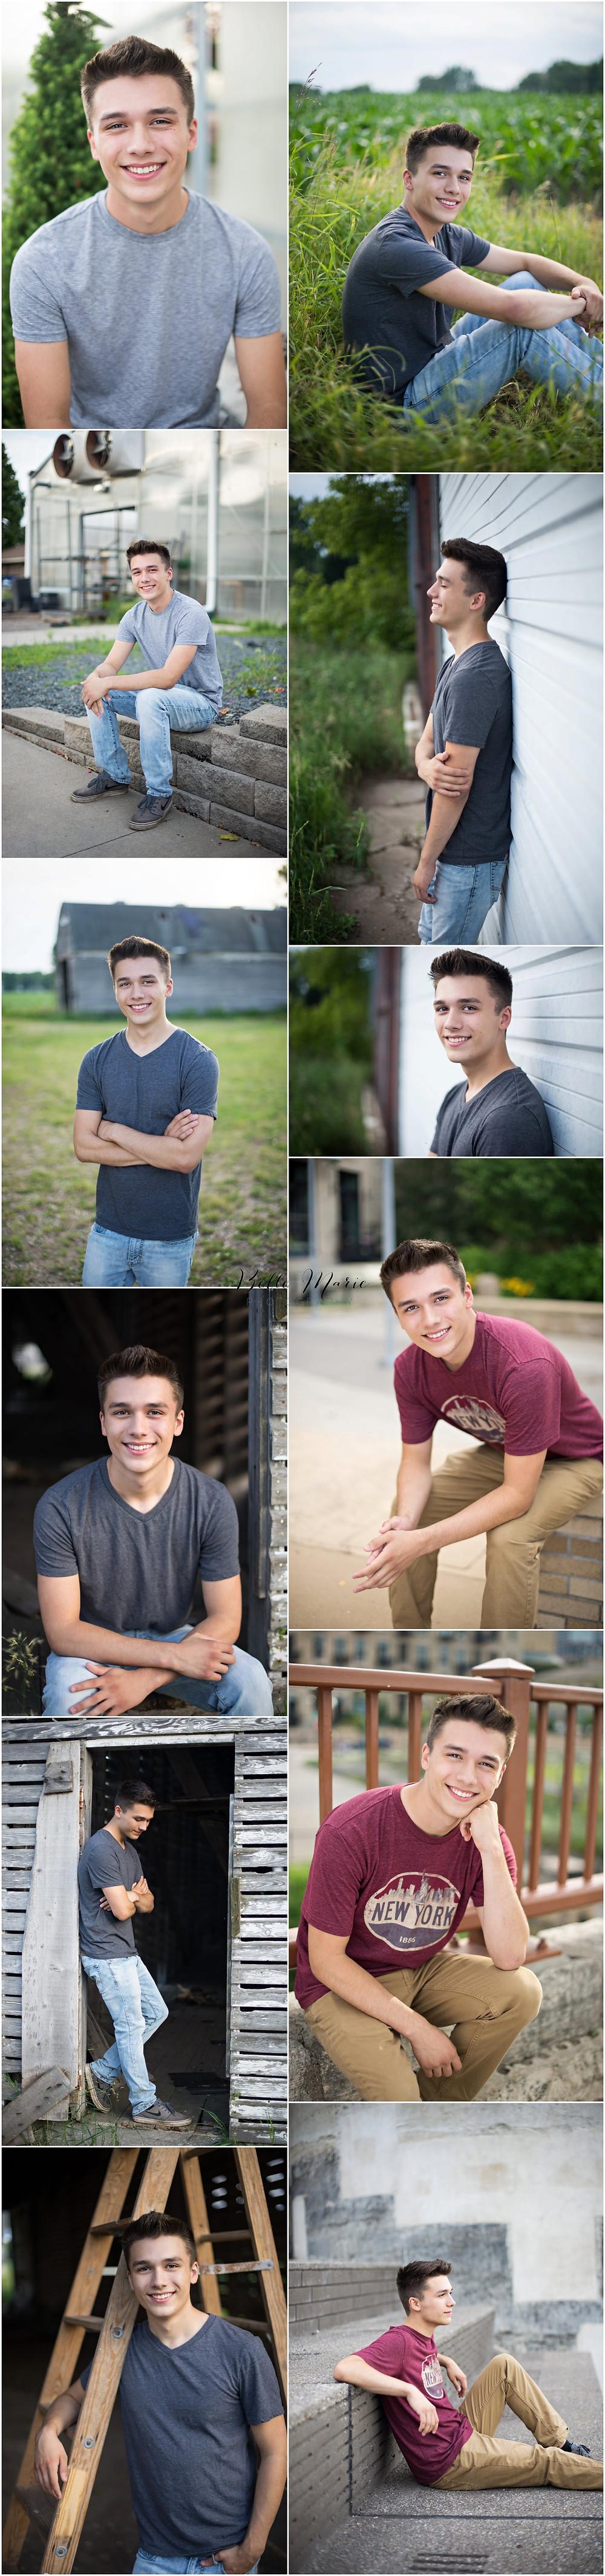 Senior boy high school senior photos